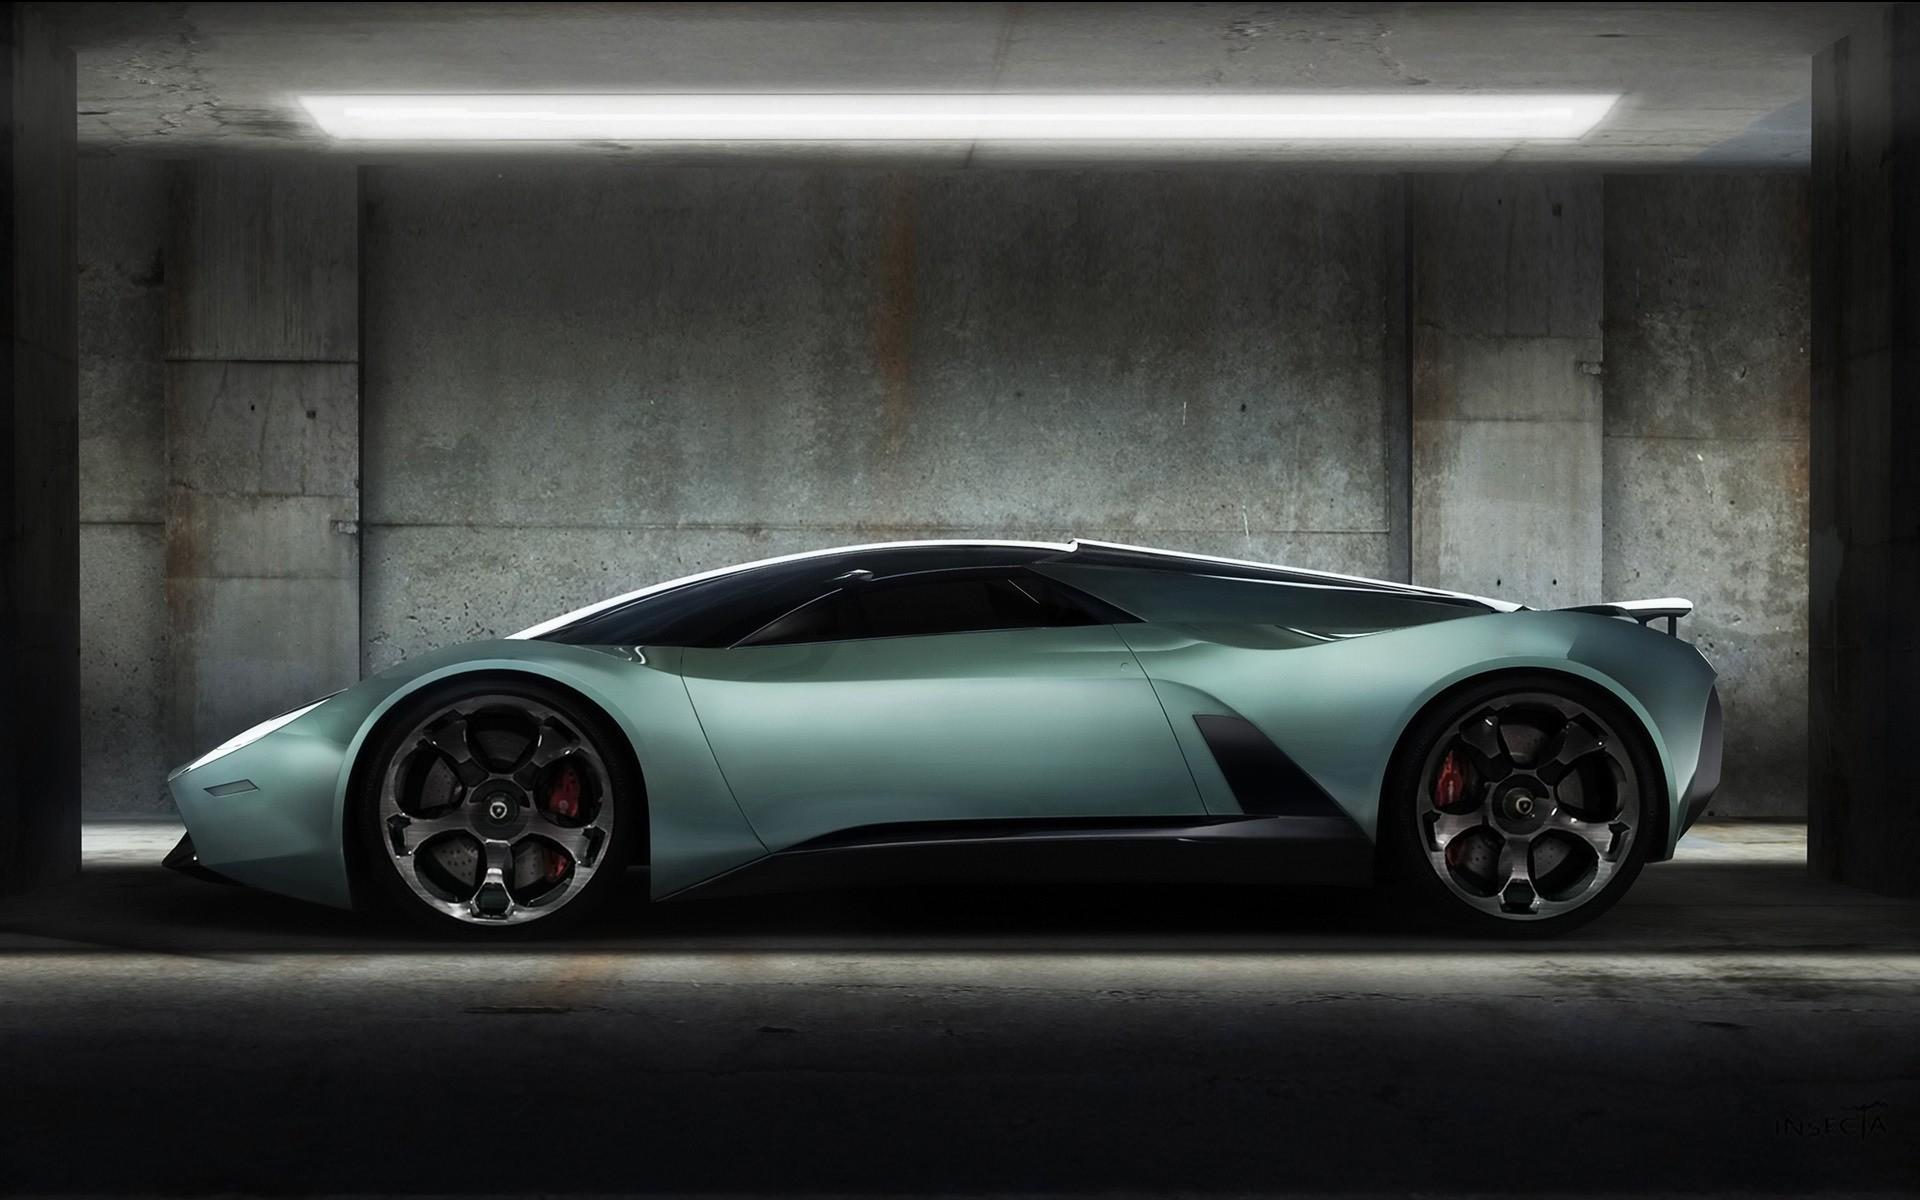 1920x1200 Supercar Wallpapers Lamborghini 3